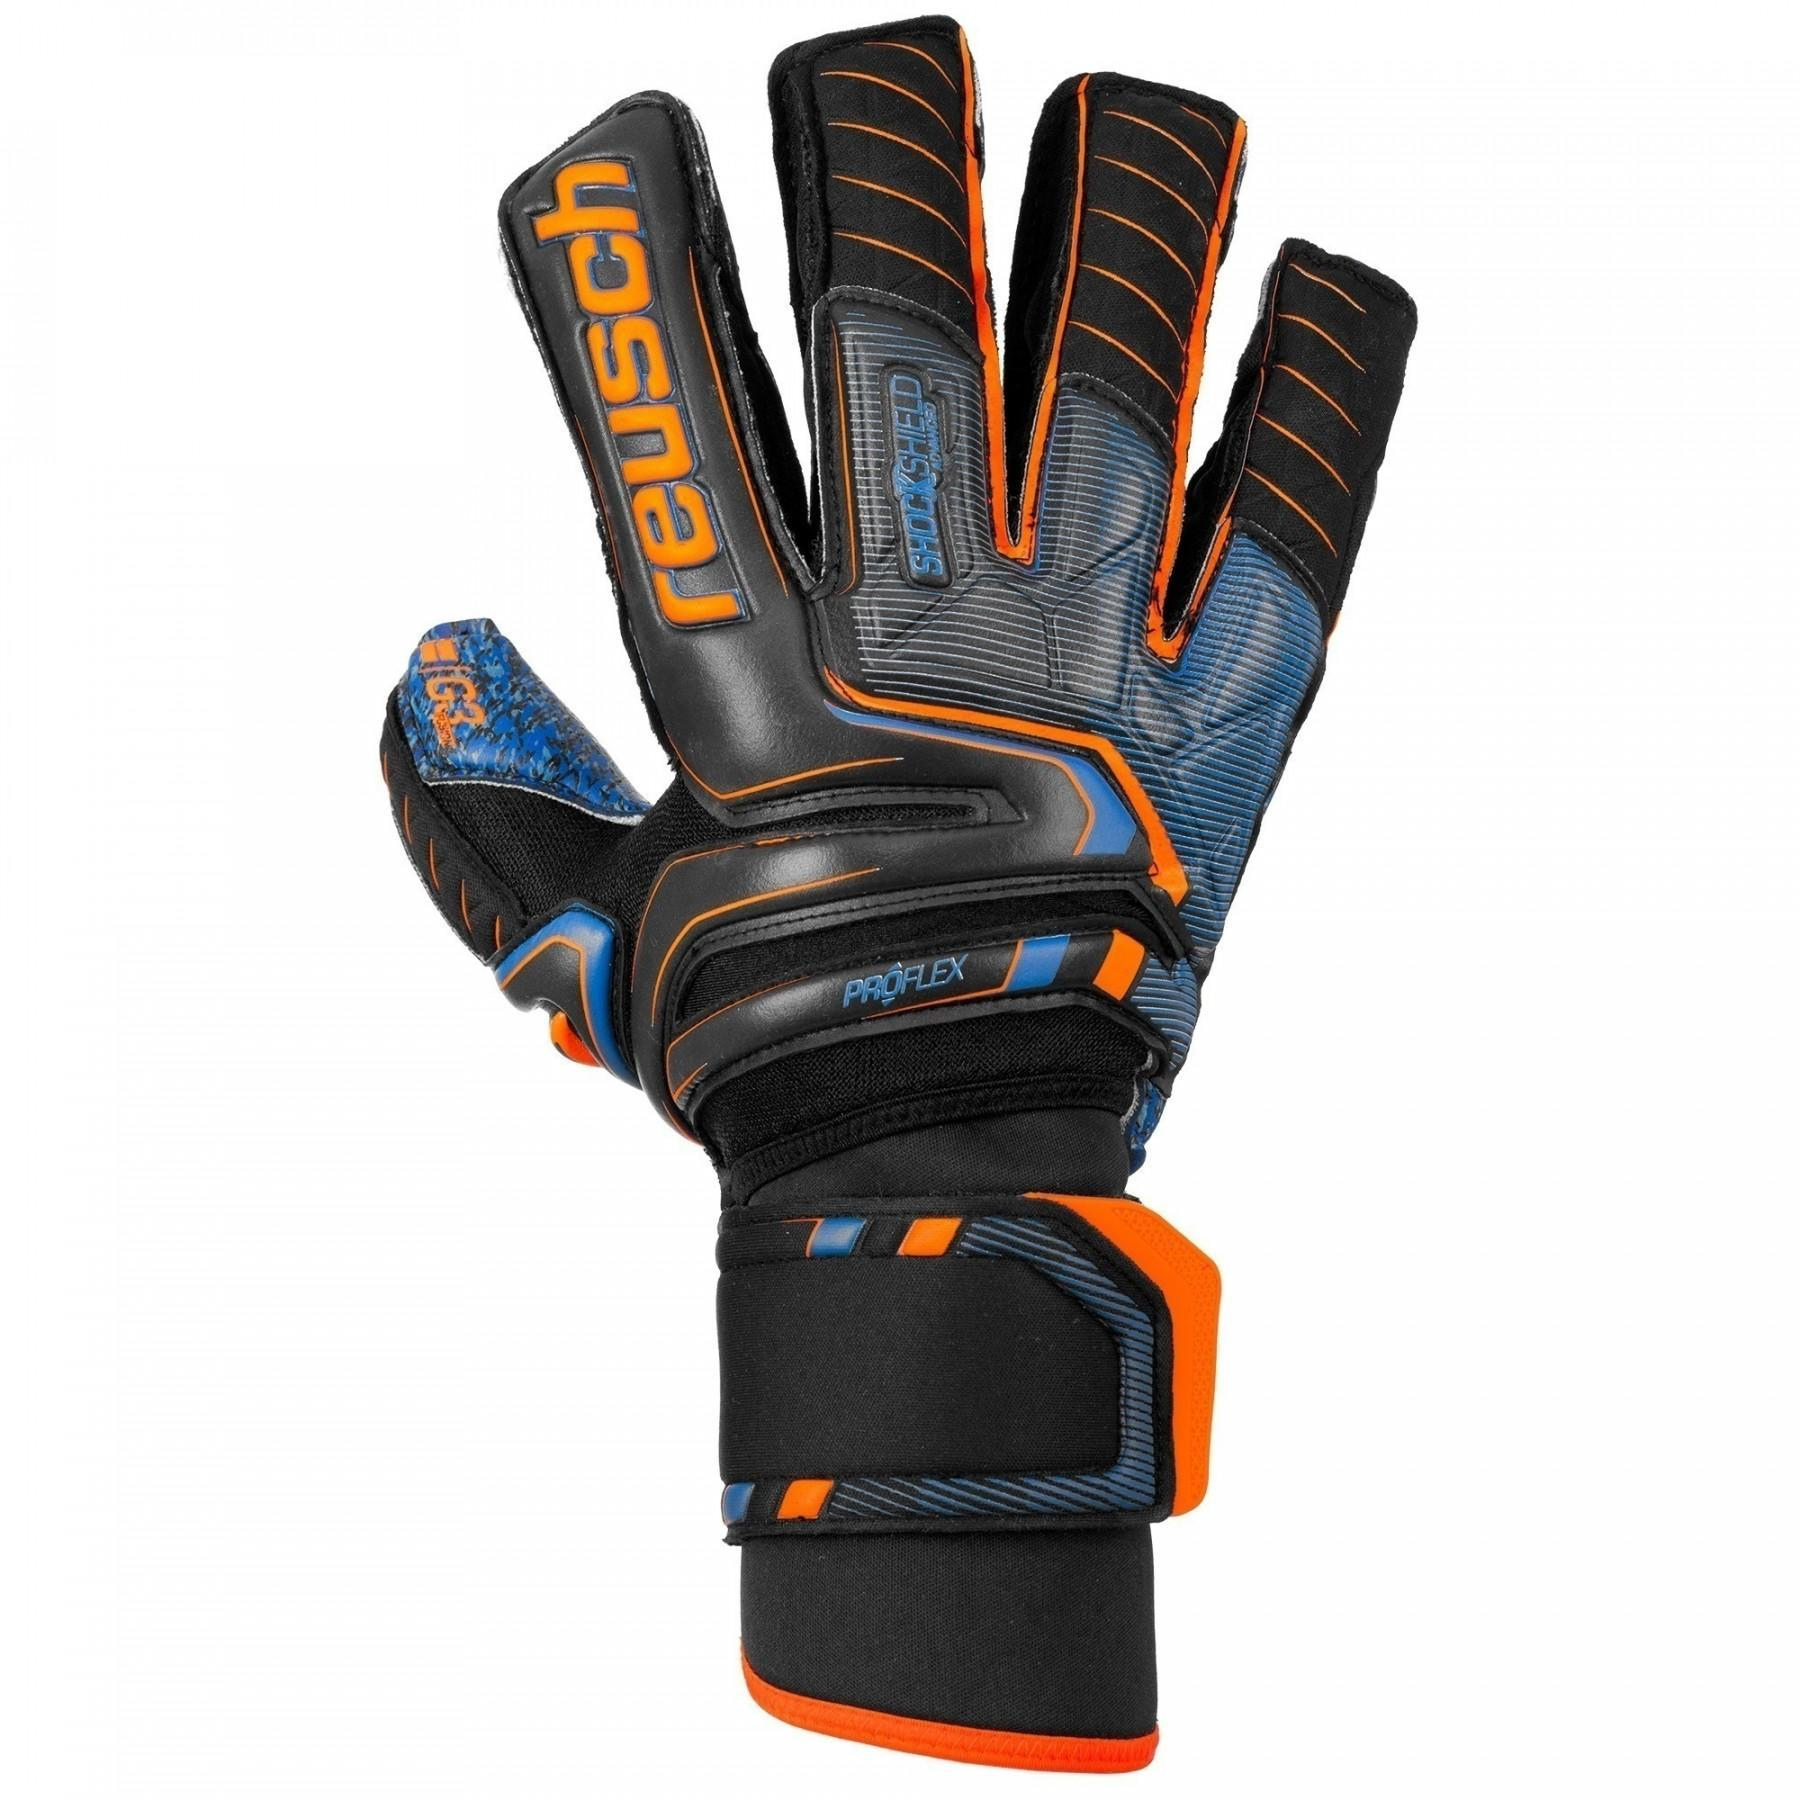 Gants Reusch Attrakt G3 Fusion Ortho-Tec Goaliator